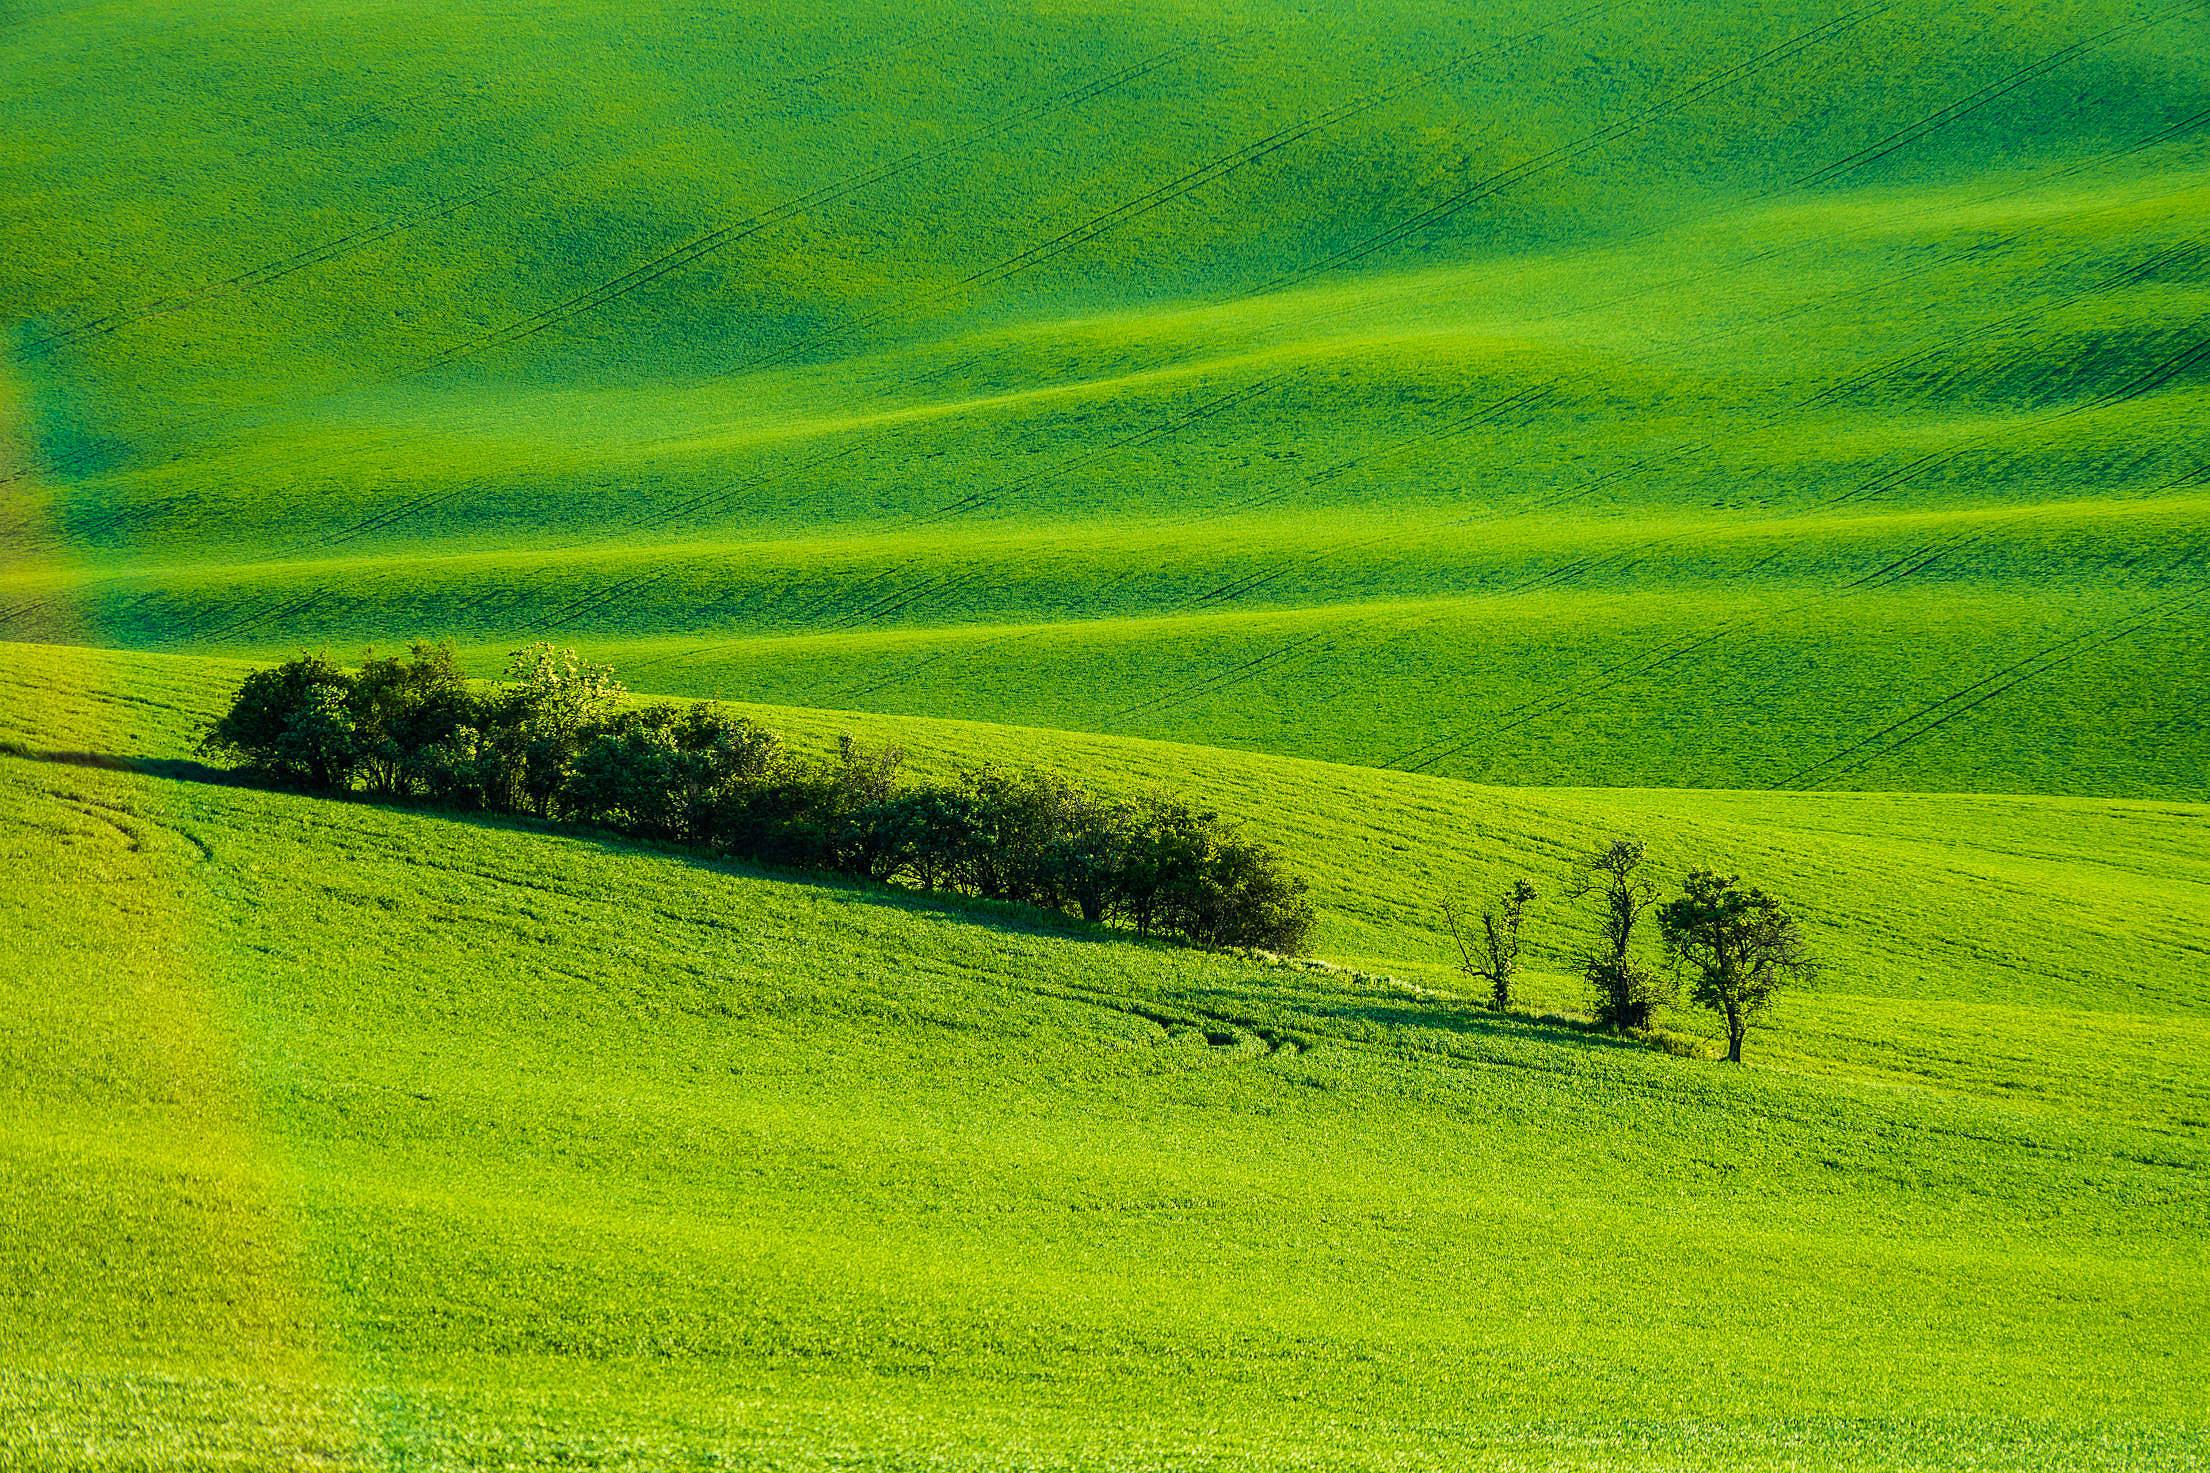 Moravian Tuscany Green Wheat Fields Free Stock Photo